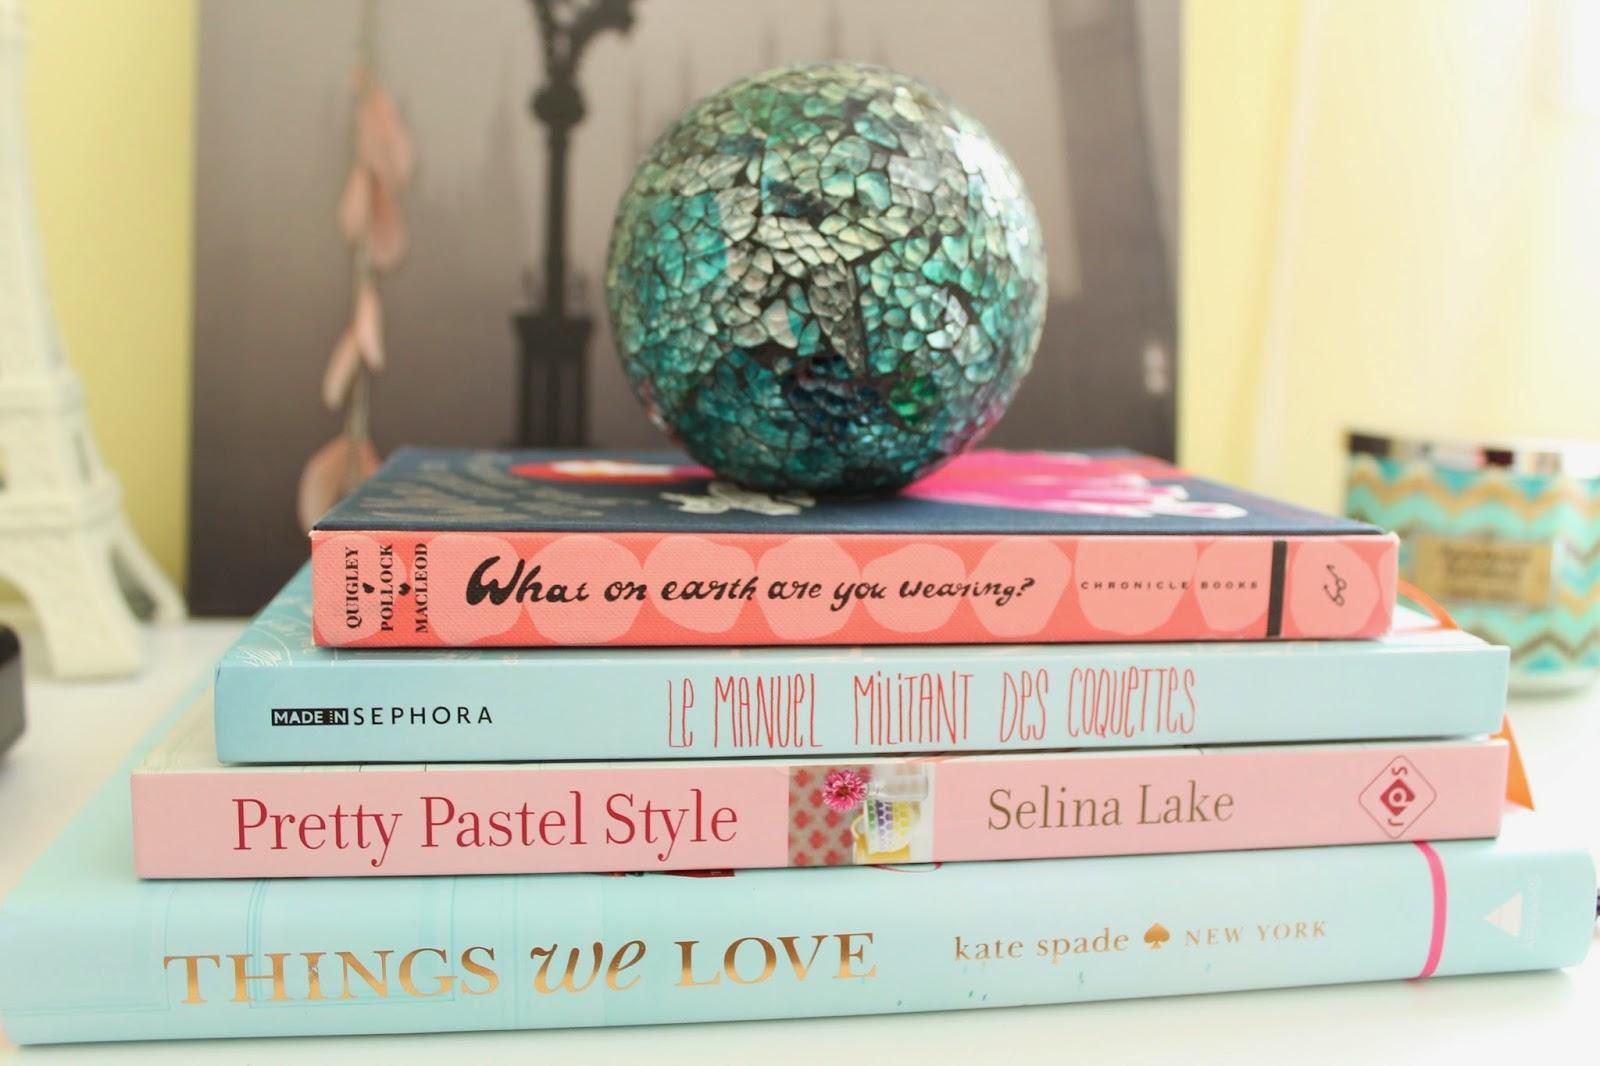 Kate Spade, Selina Lake, books